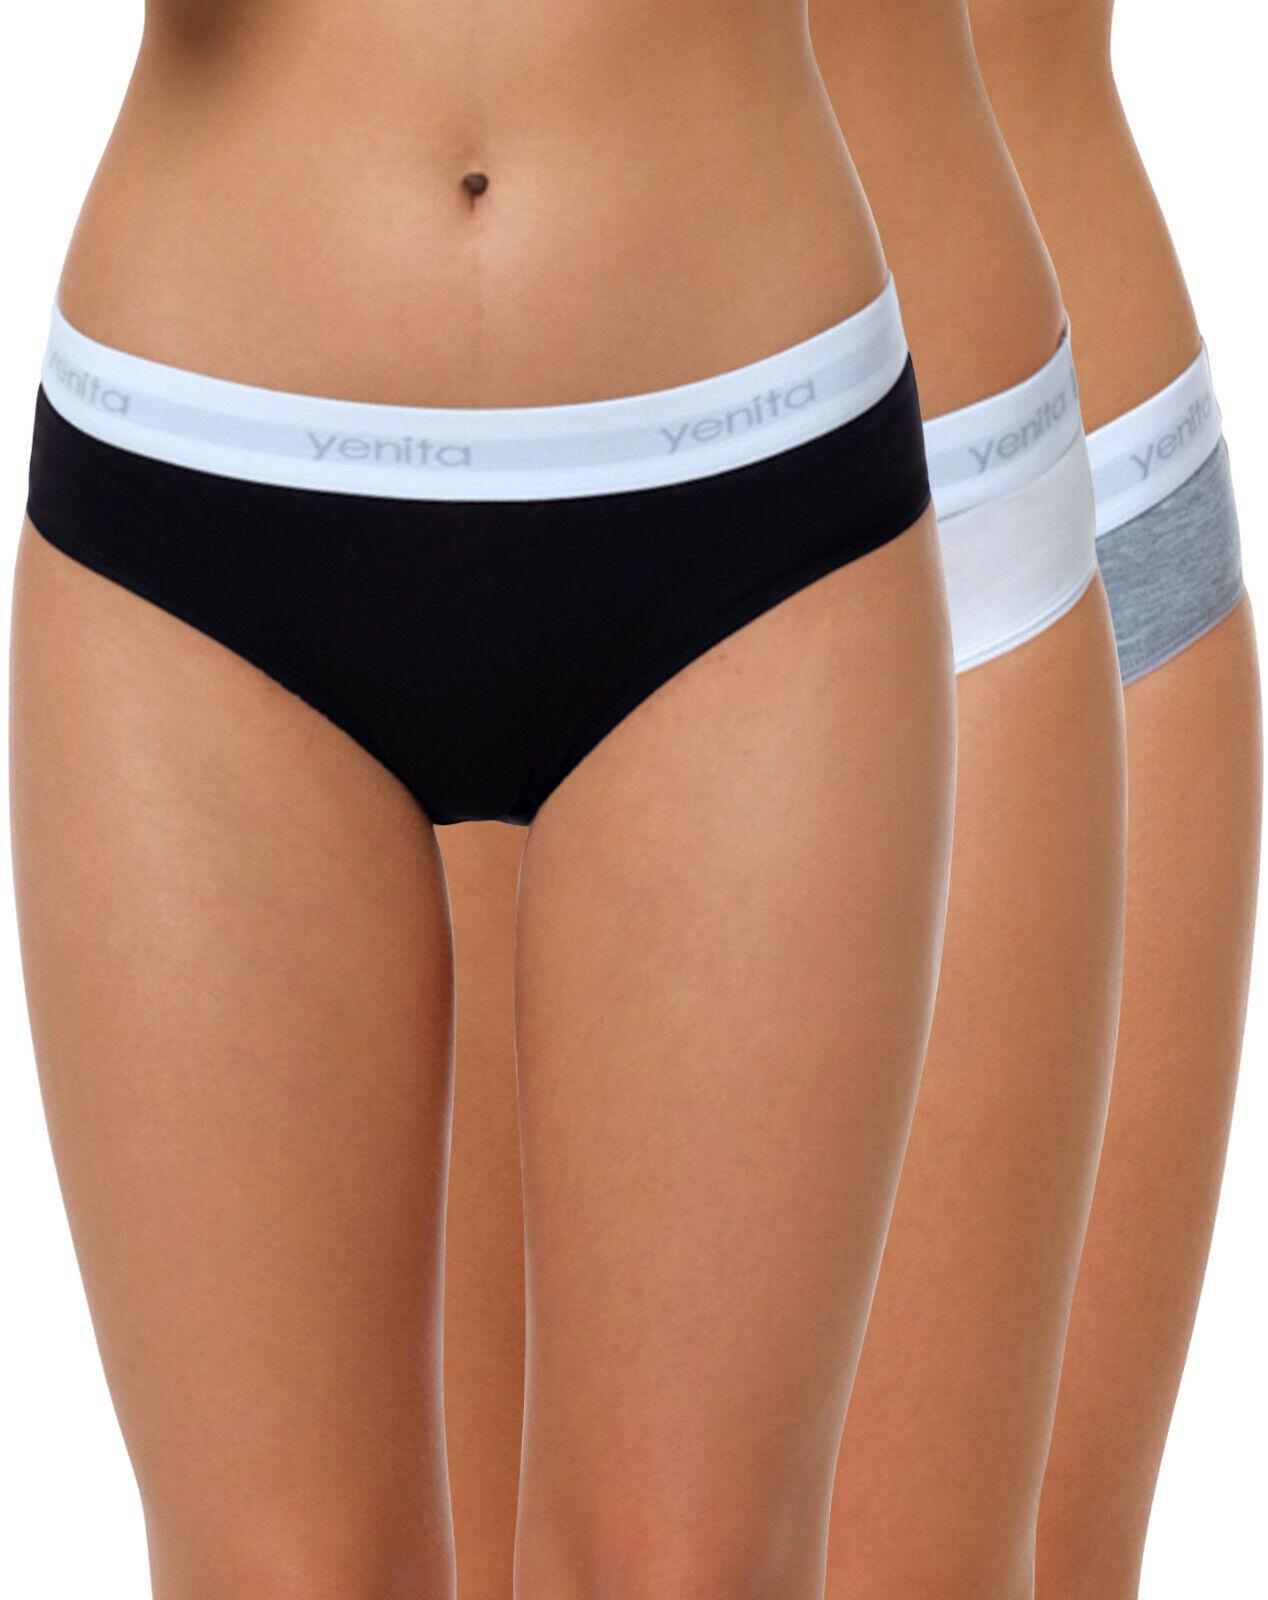 3er Set Yenita® Damen Bikini-Slip Unterwäsche Slips Hüftslip Unterhose